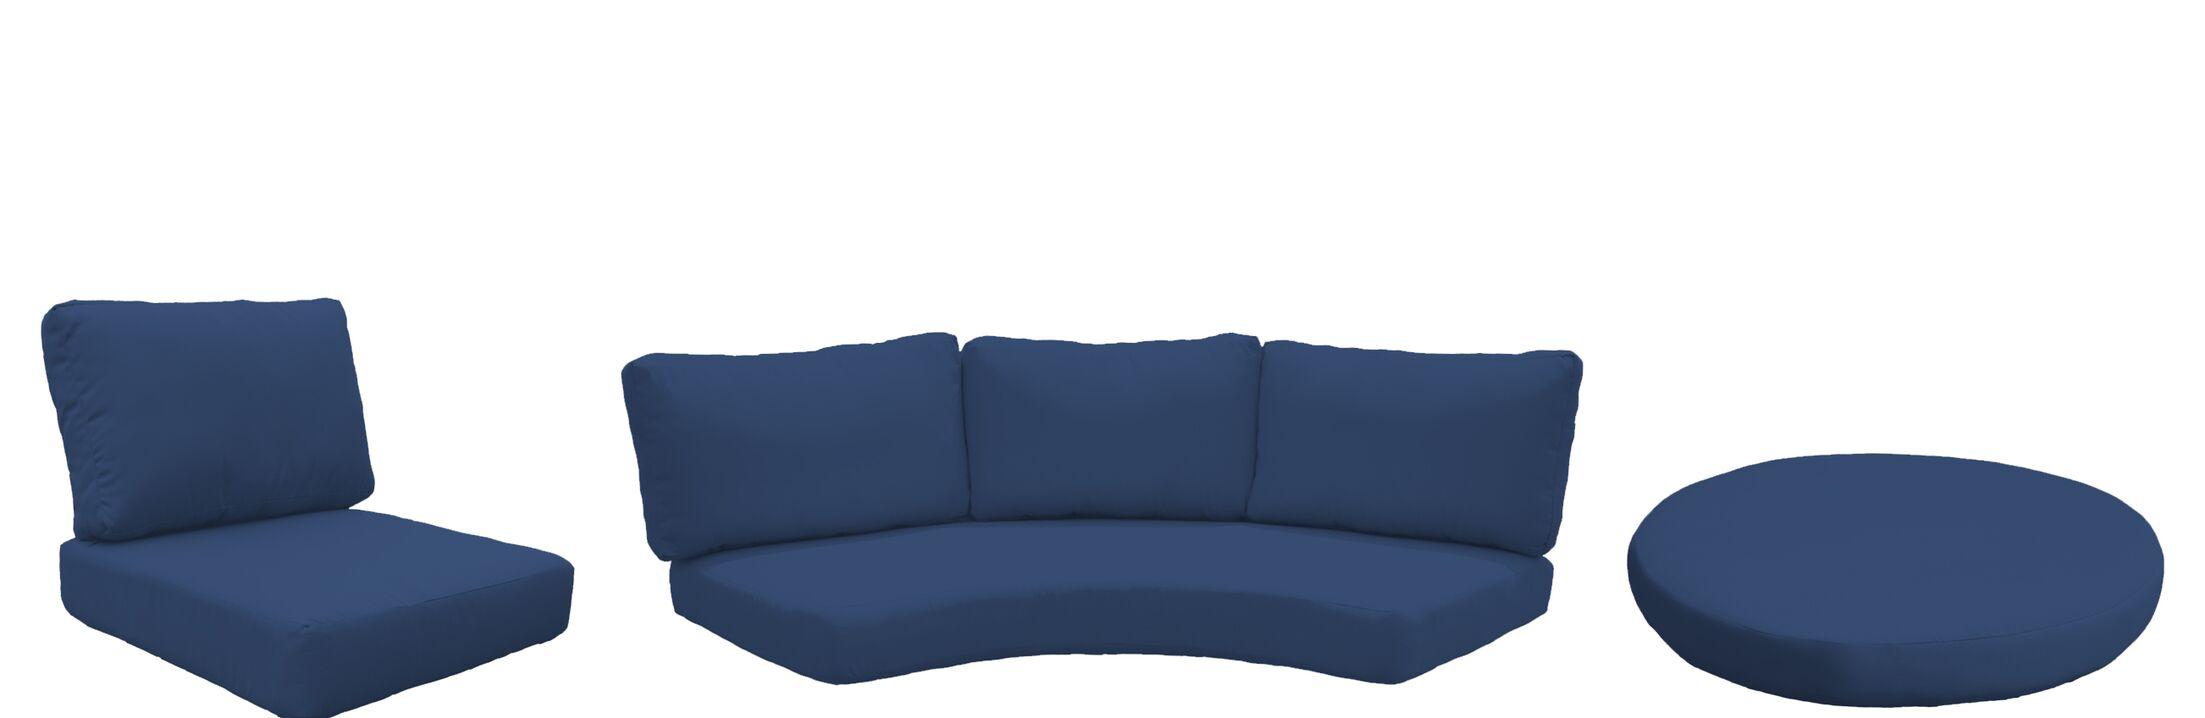 Barbados 15 Piece Outdoor Cushion Set Fabric: Navy